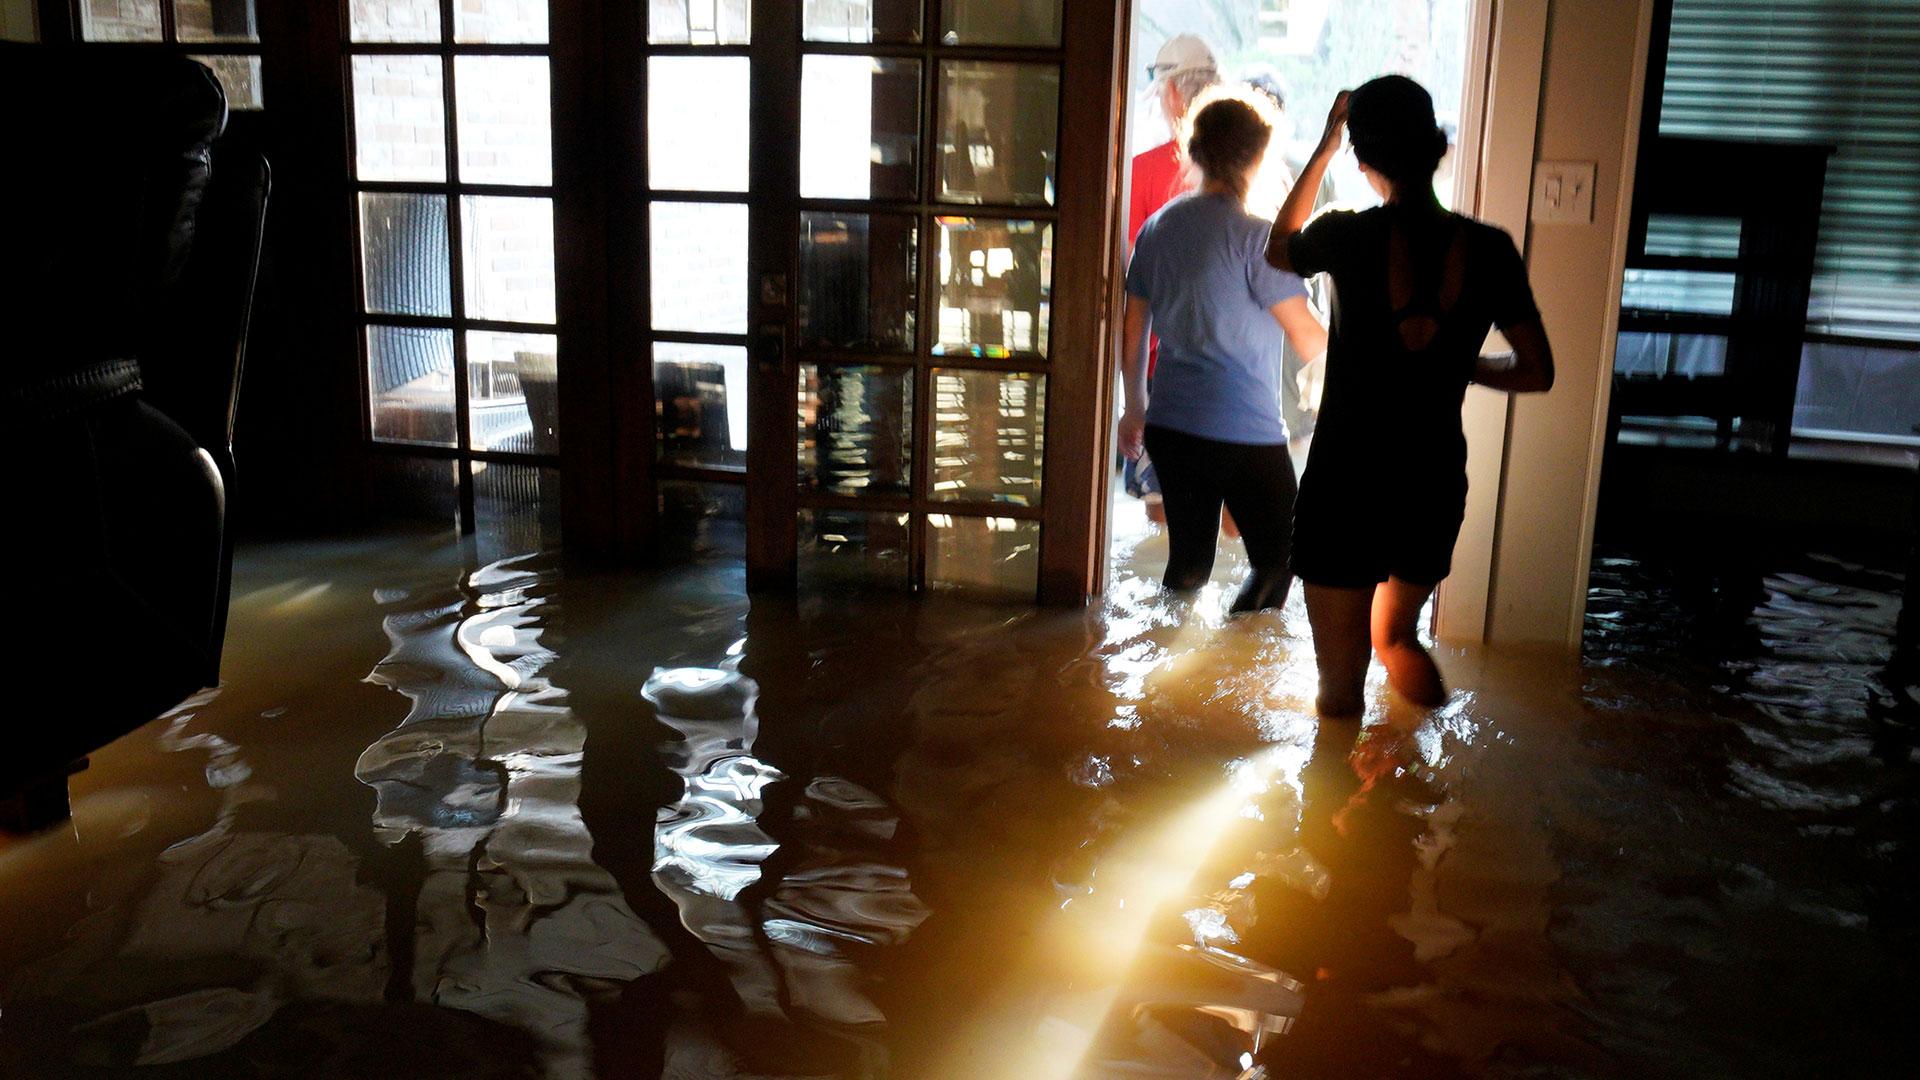 Stormen kostade 25 miljarder